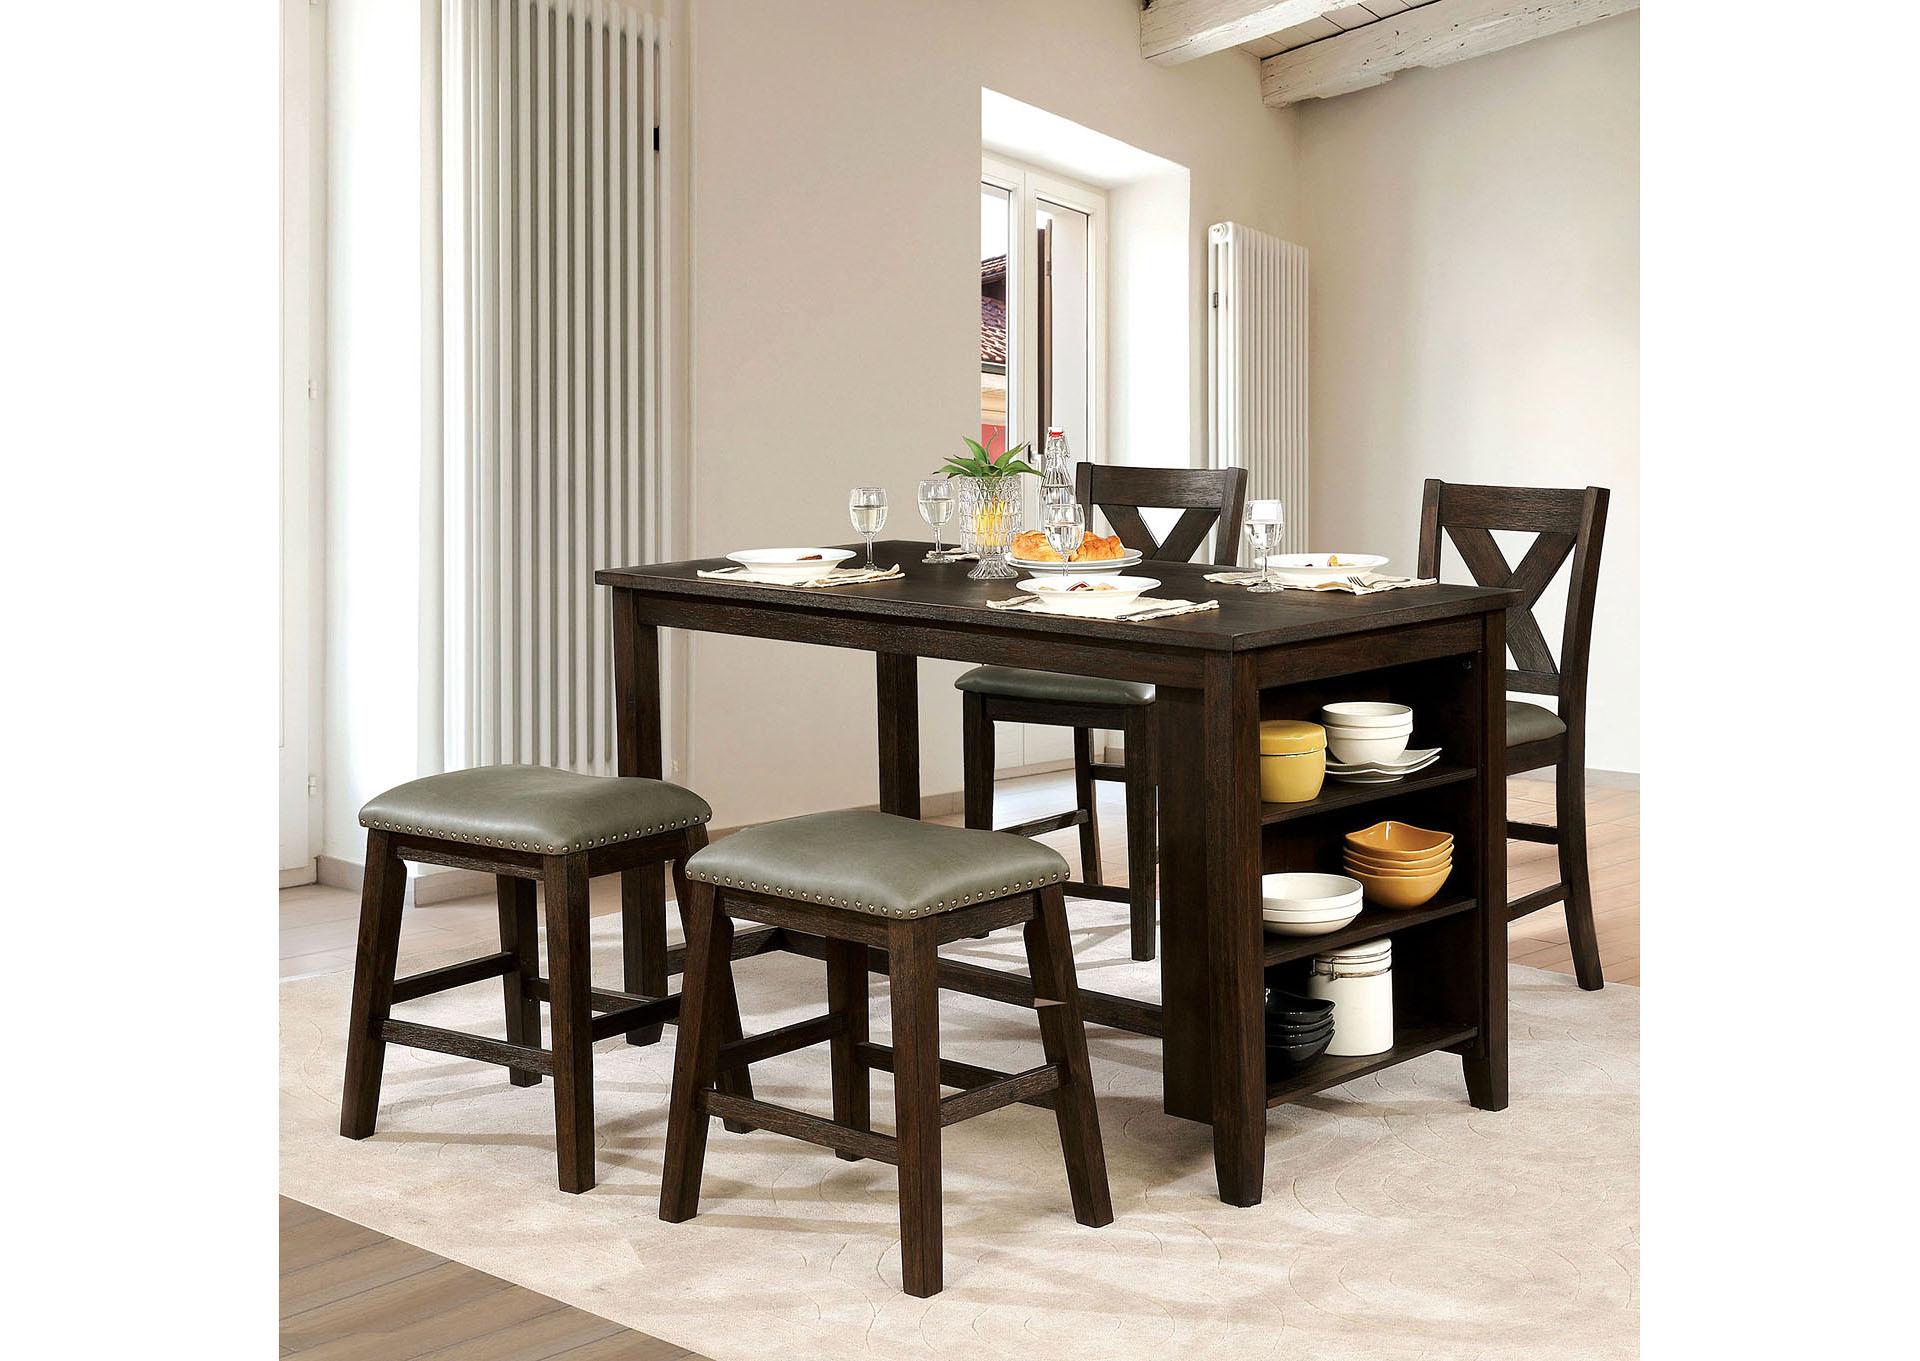 Lana dark walnut counter height tablefurniture of america